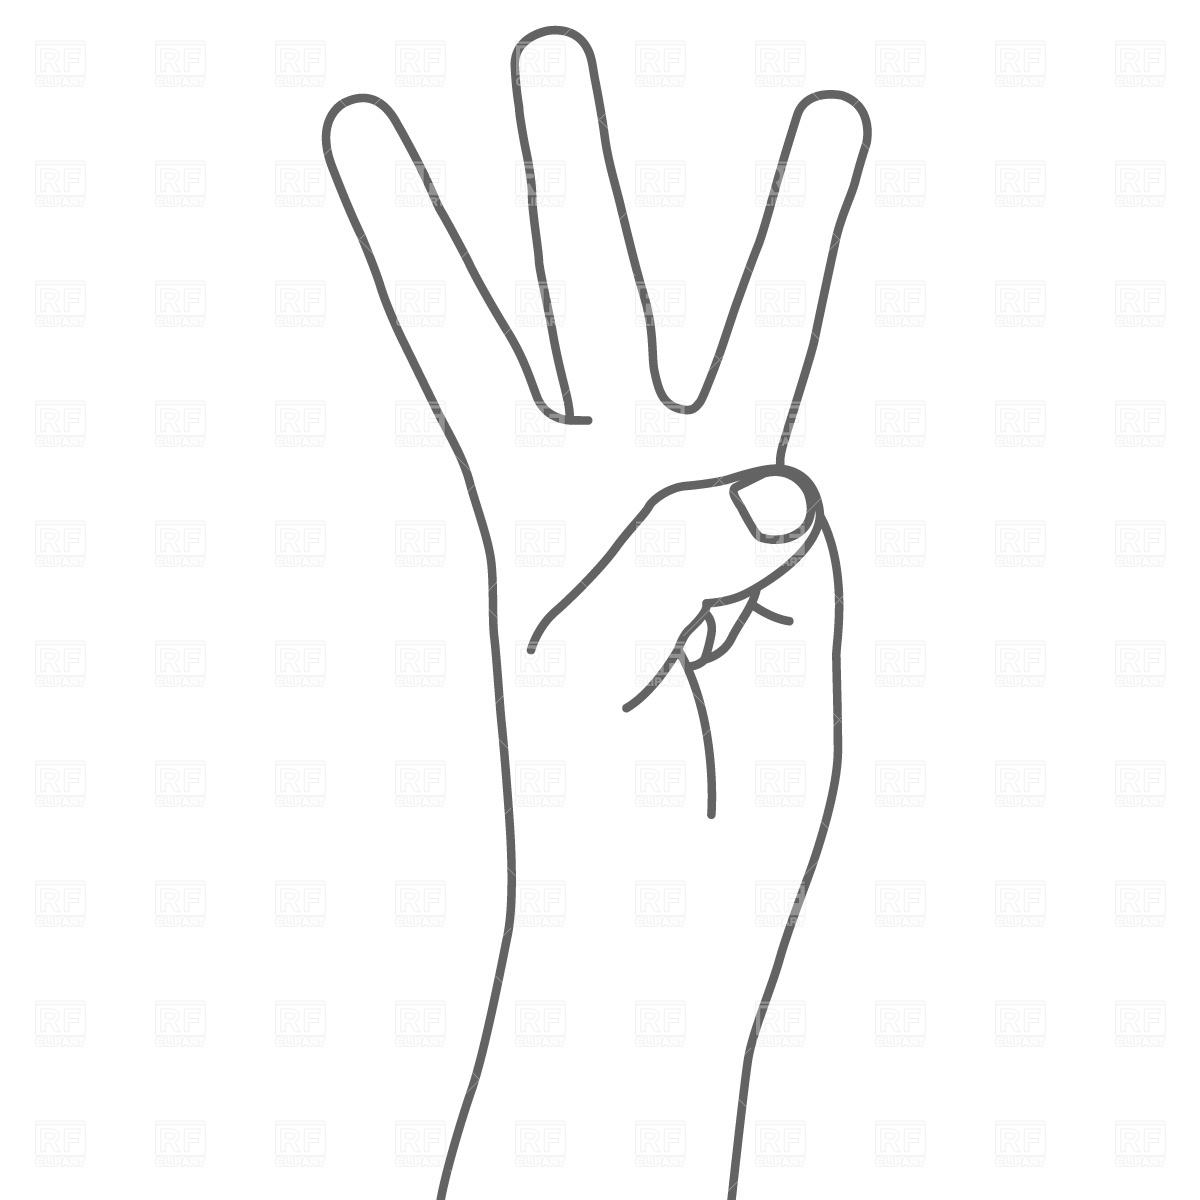 3 Fingers Clipart.